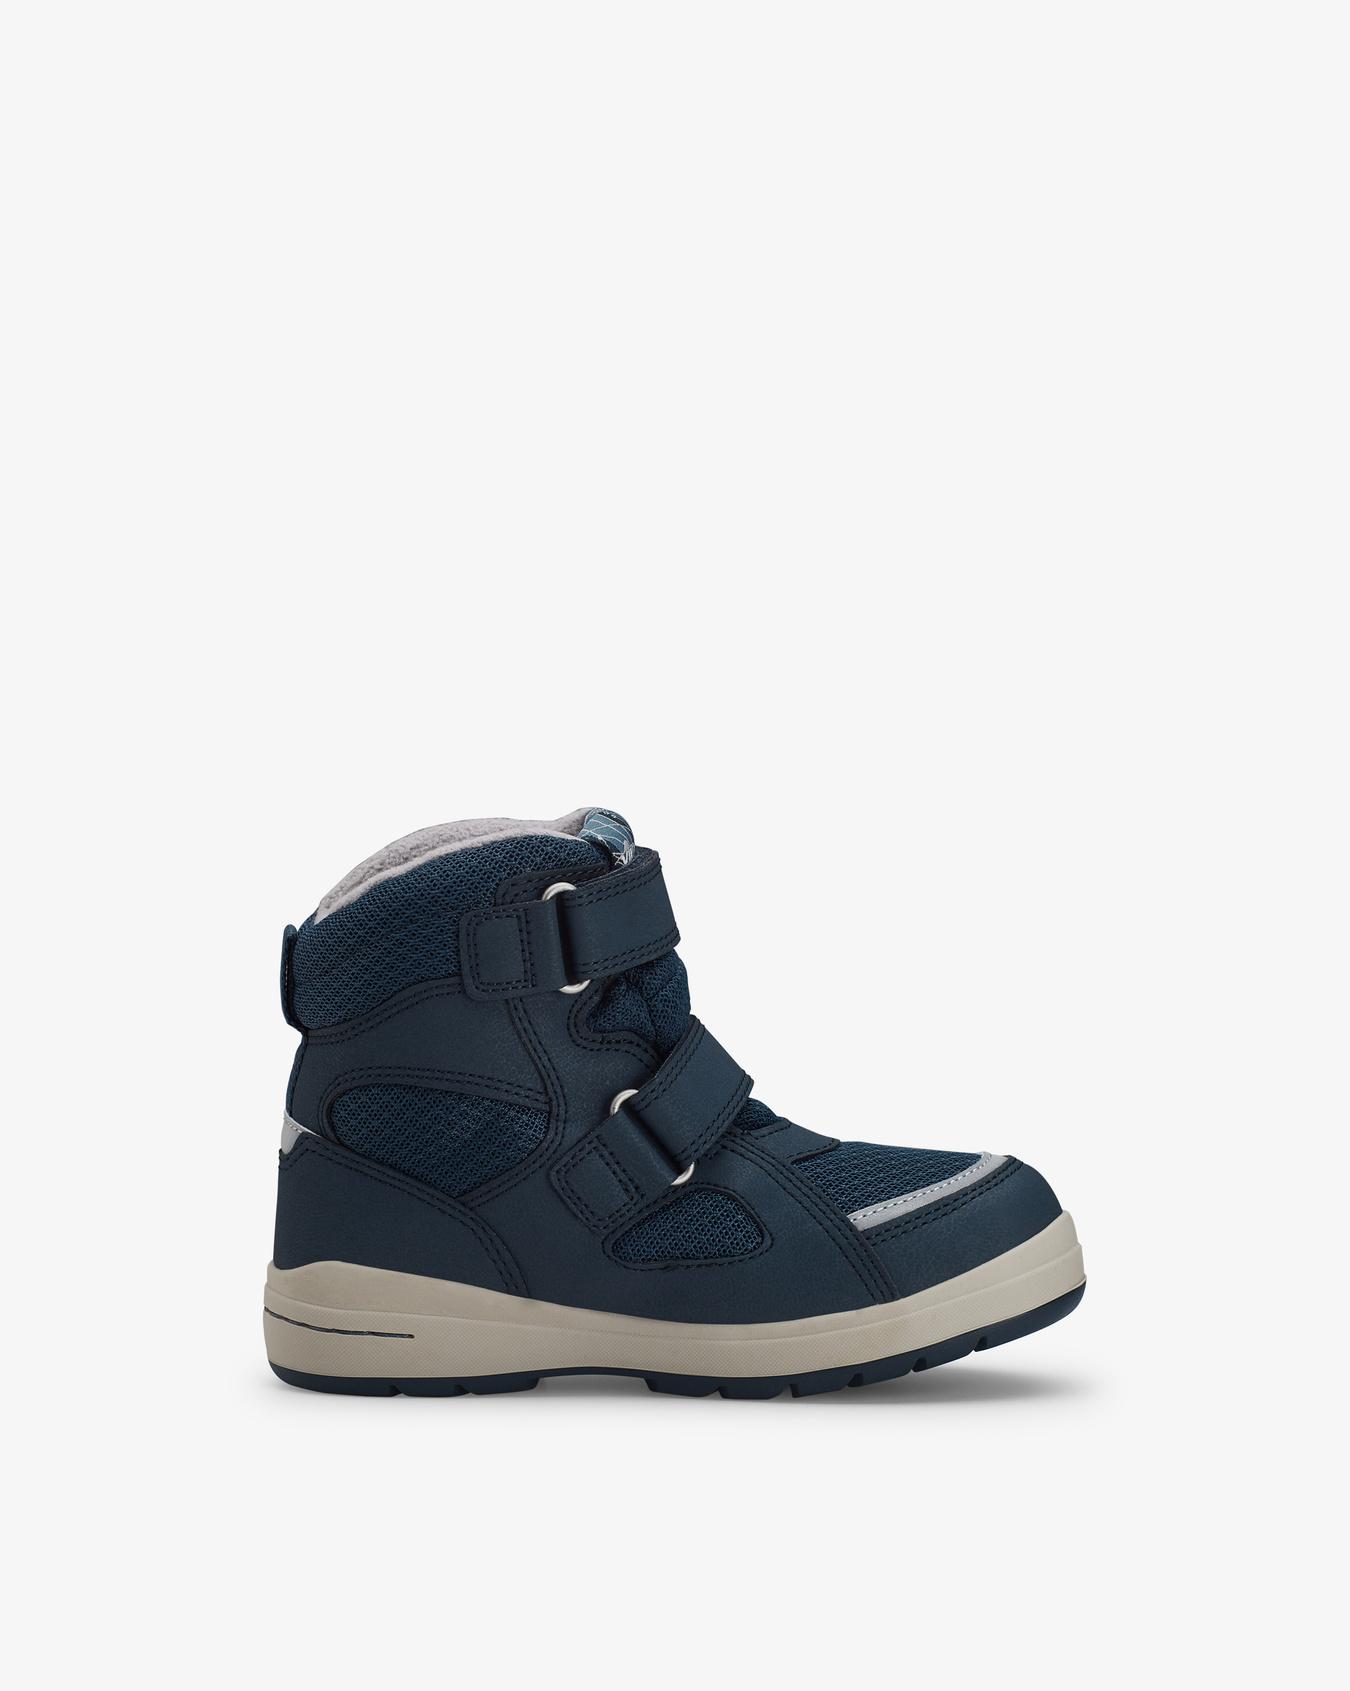 Spro GTX Navy Winter Boots